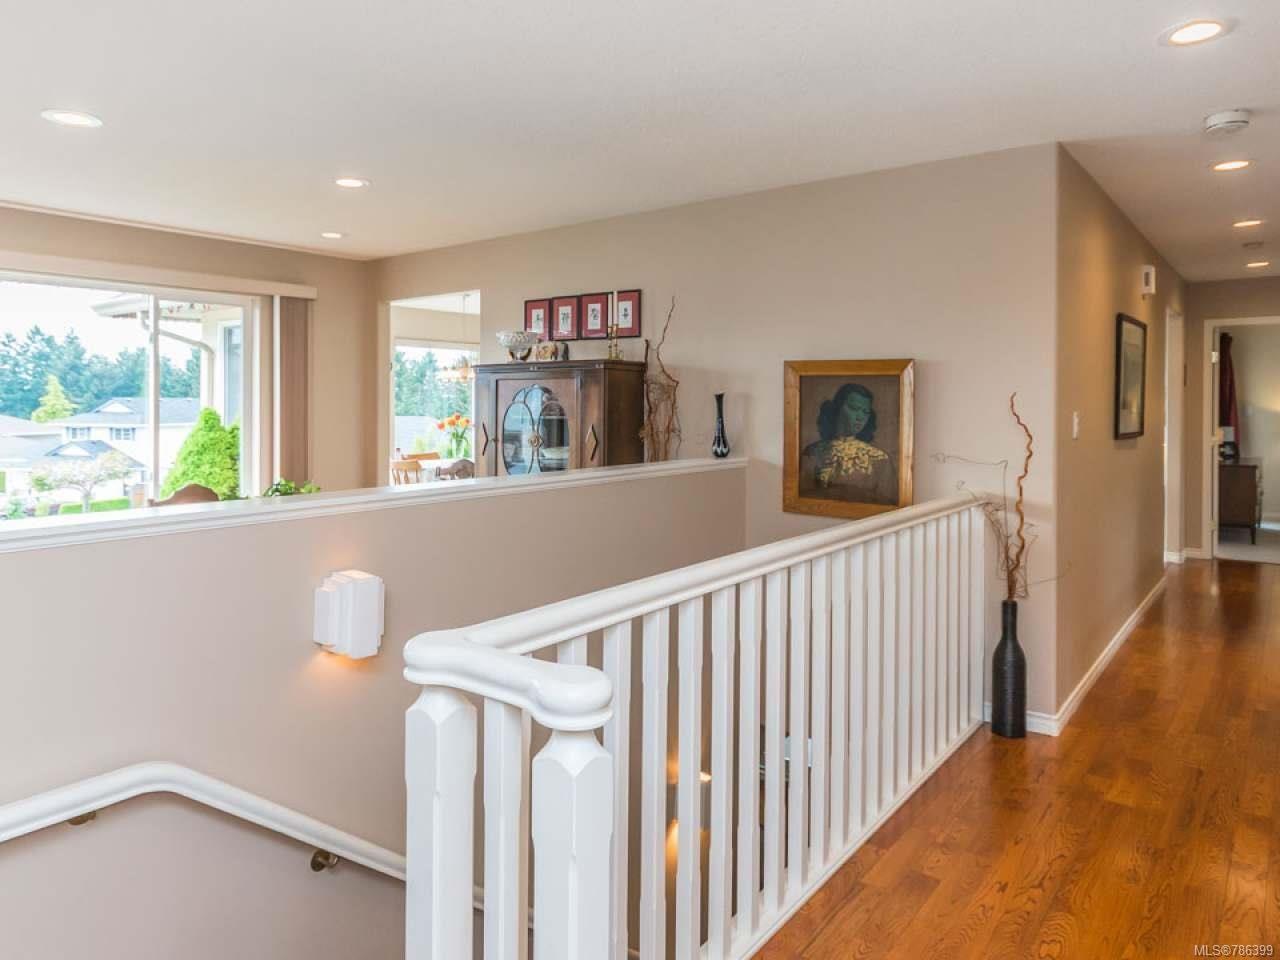 Photo 20: Photos: 5371 HIGHRIDGE PLACE in NANAIMO: Na North Nanaimo House for sale (Nanaimo)  : MLS®# 786399